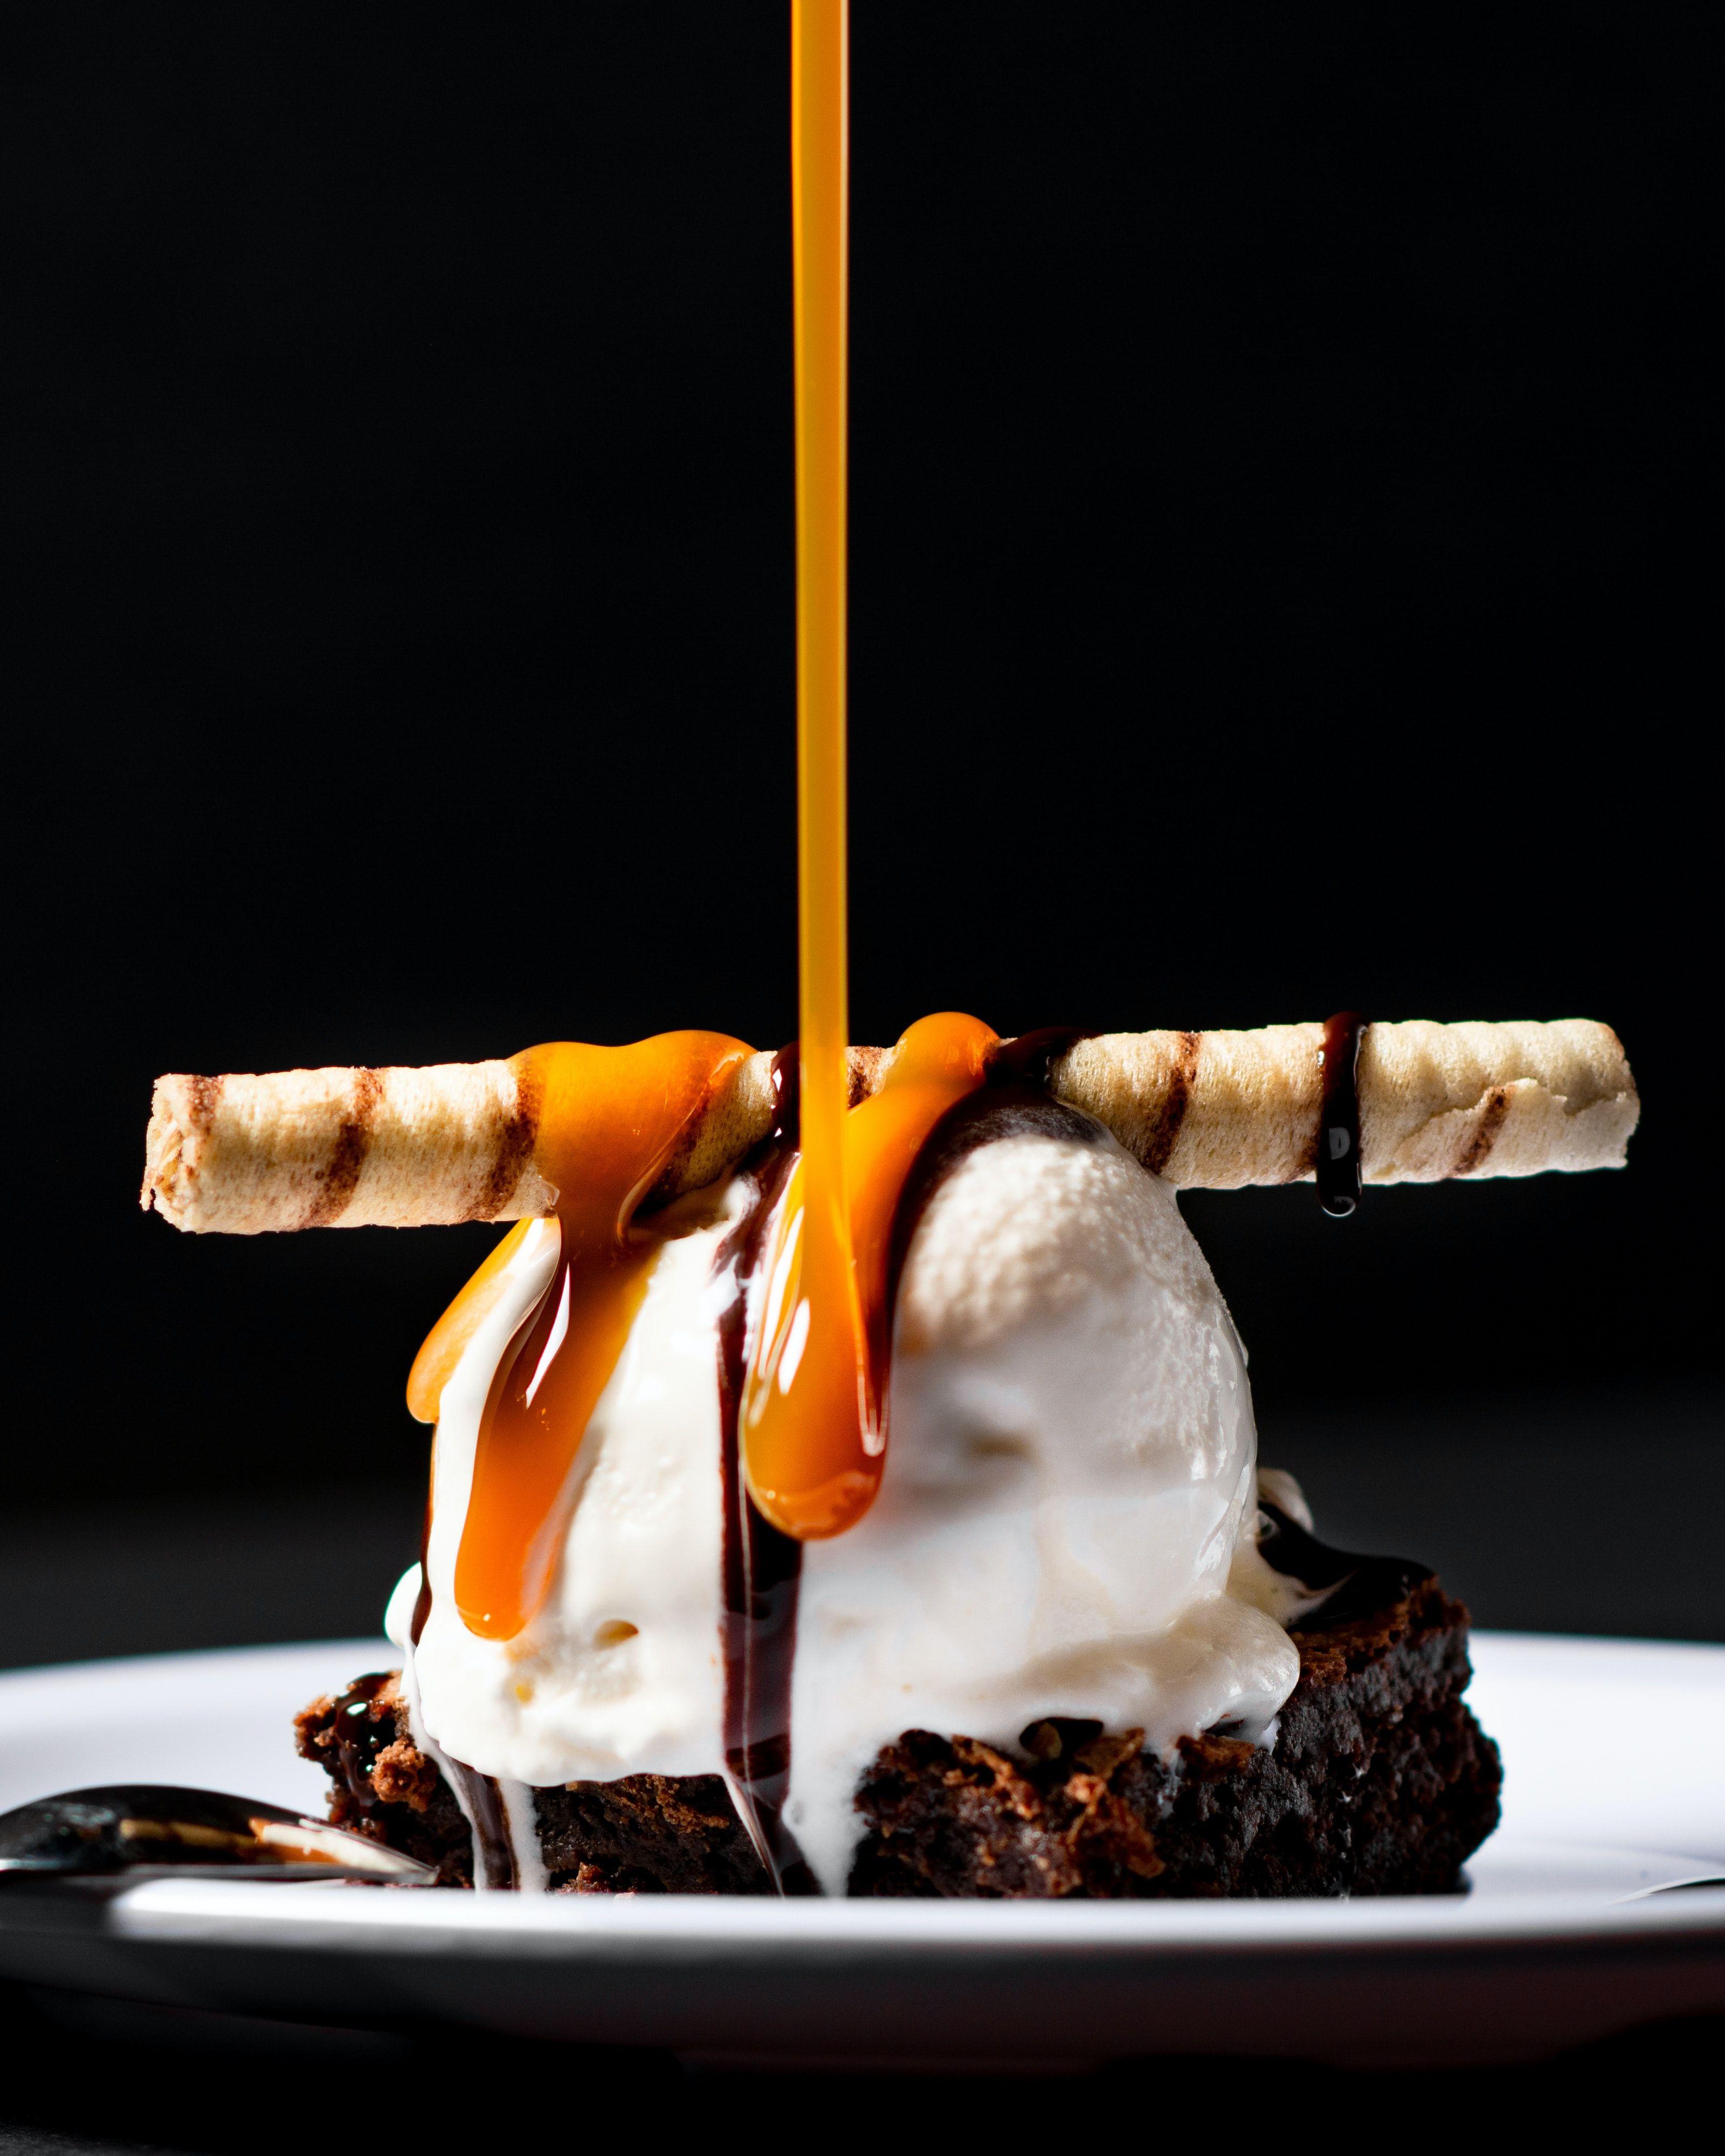 Browne With Ice Cream Dessert Recipes Desserts Dessert Recipes Easy